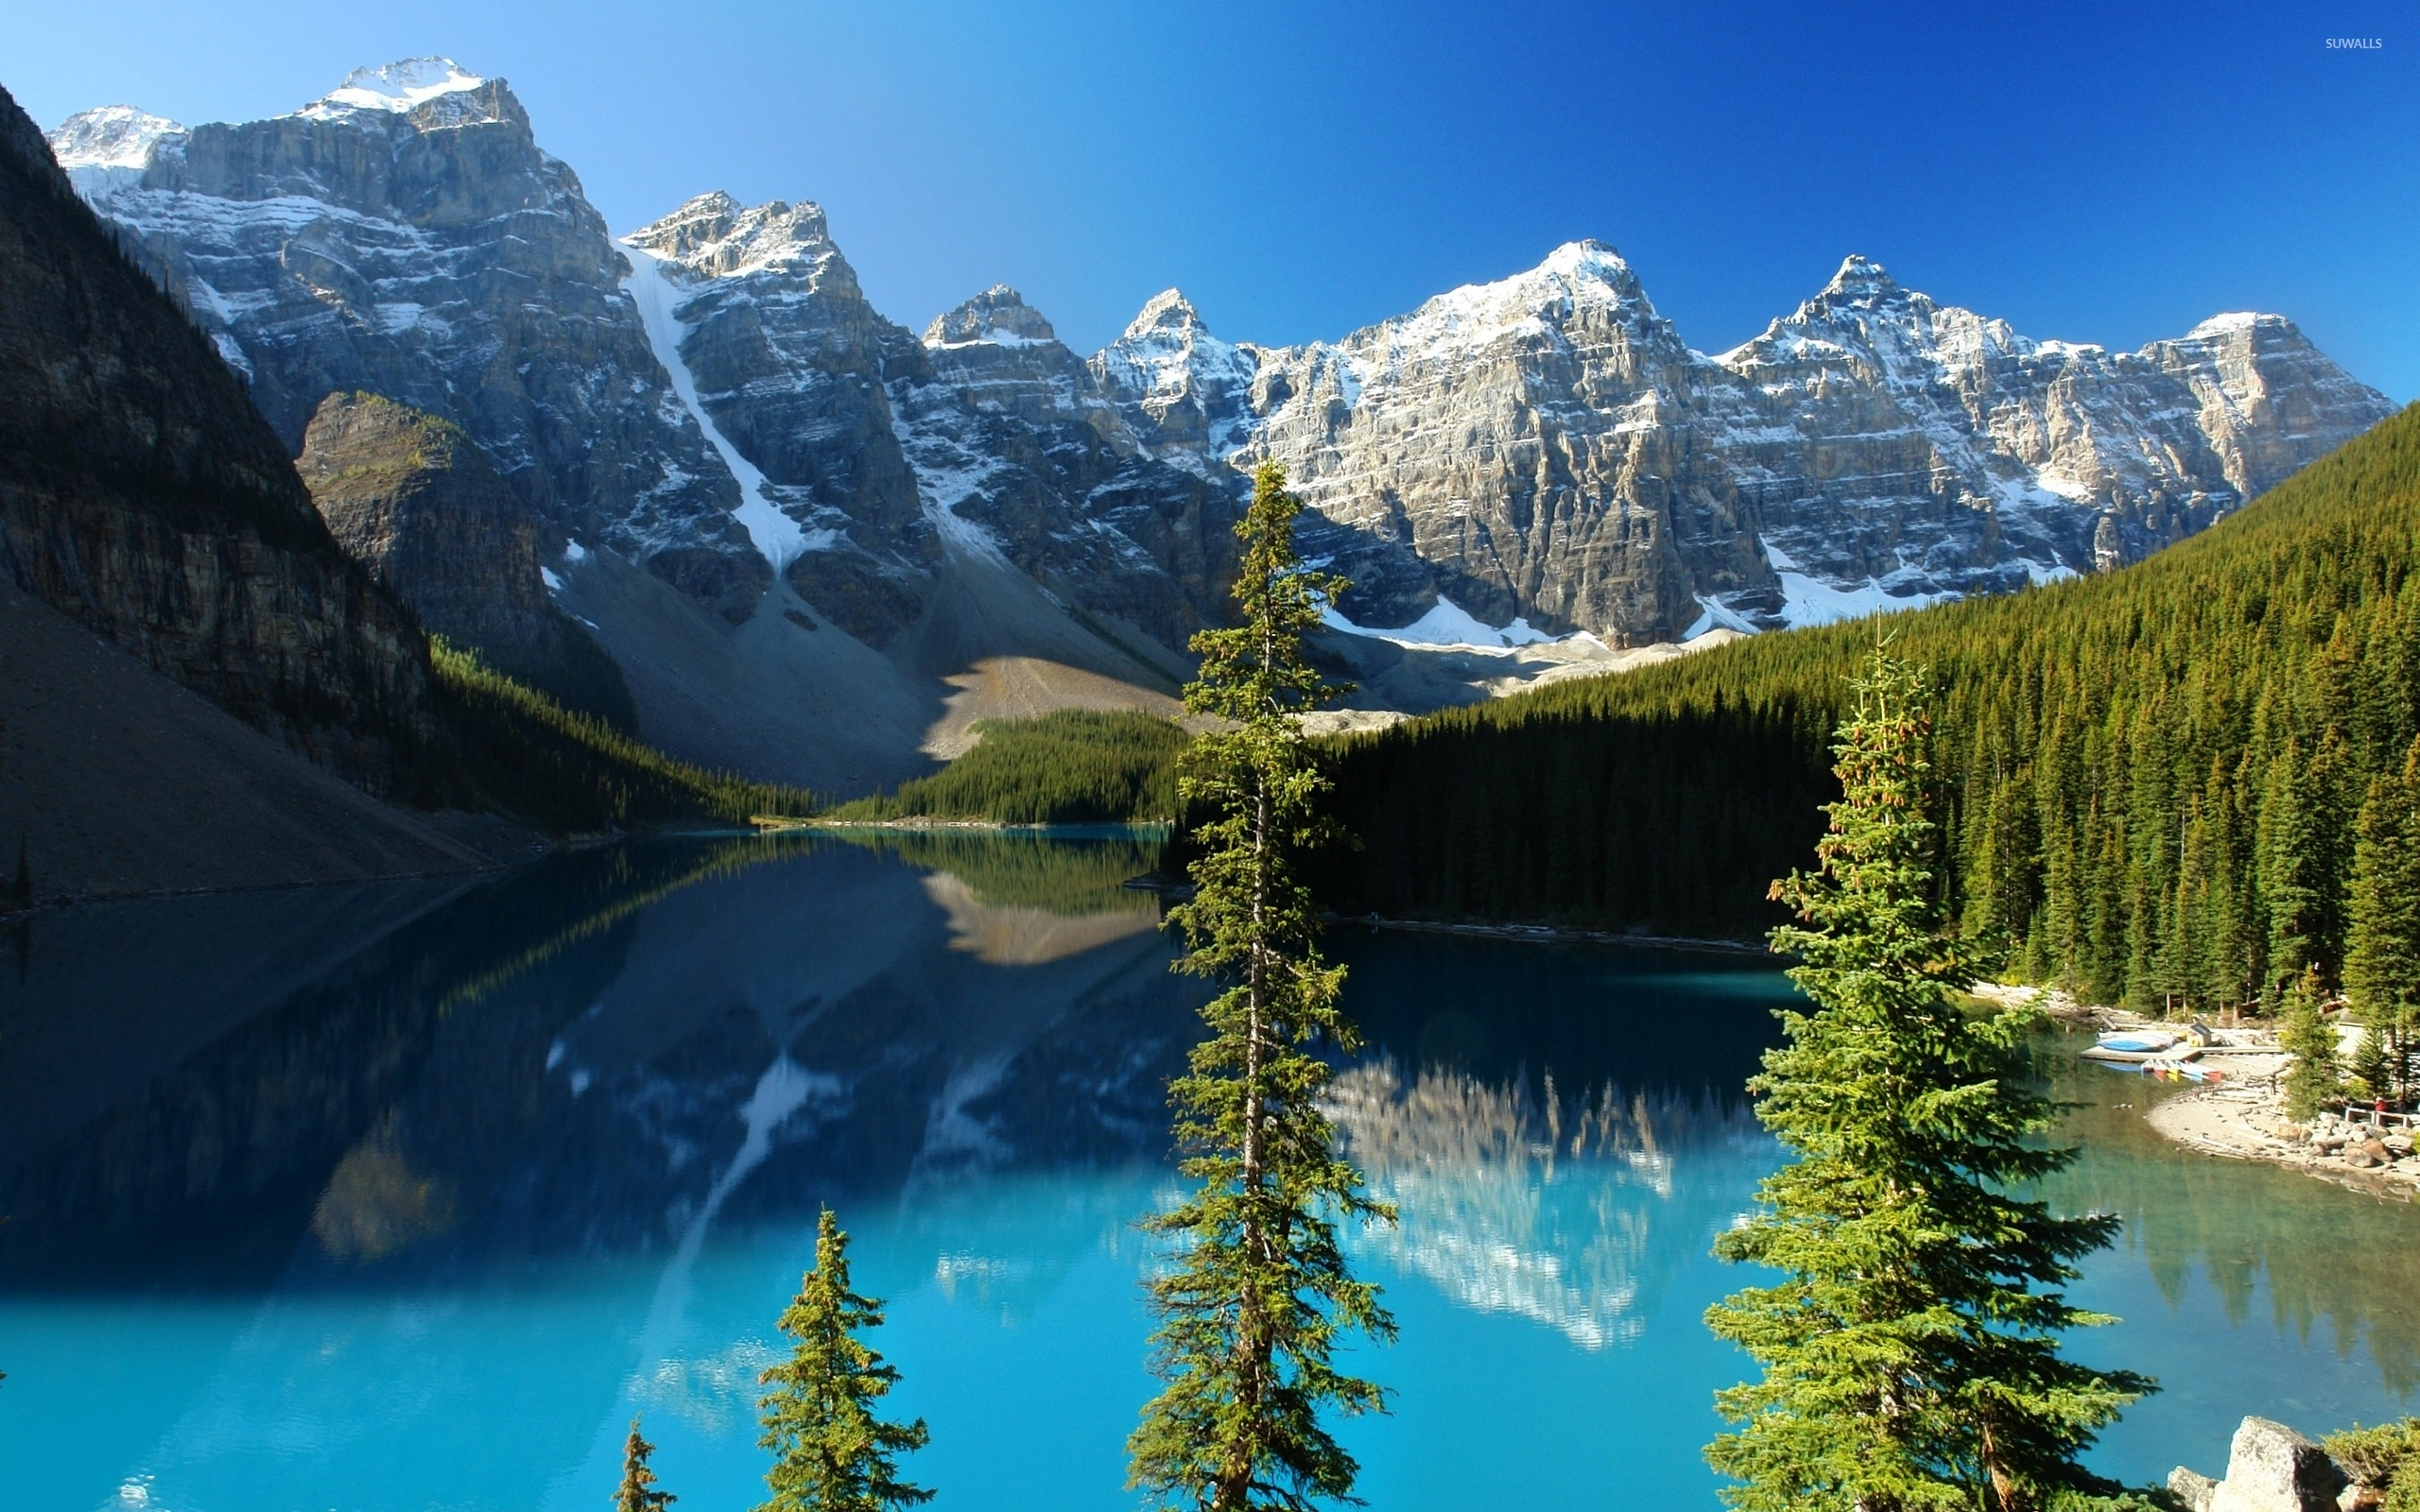 banff national park 5 - photo #3